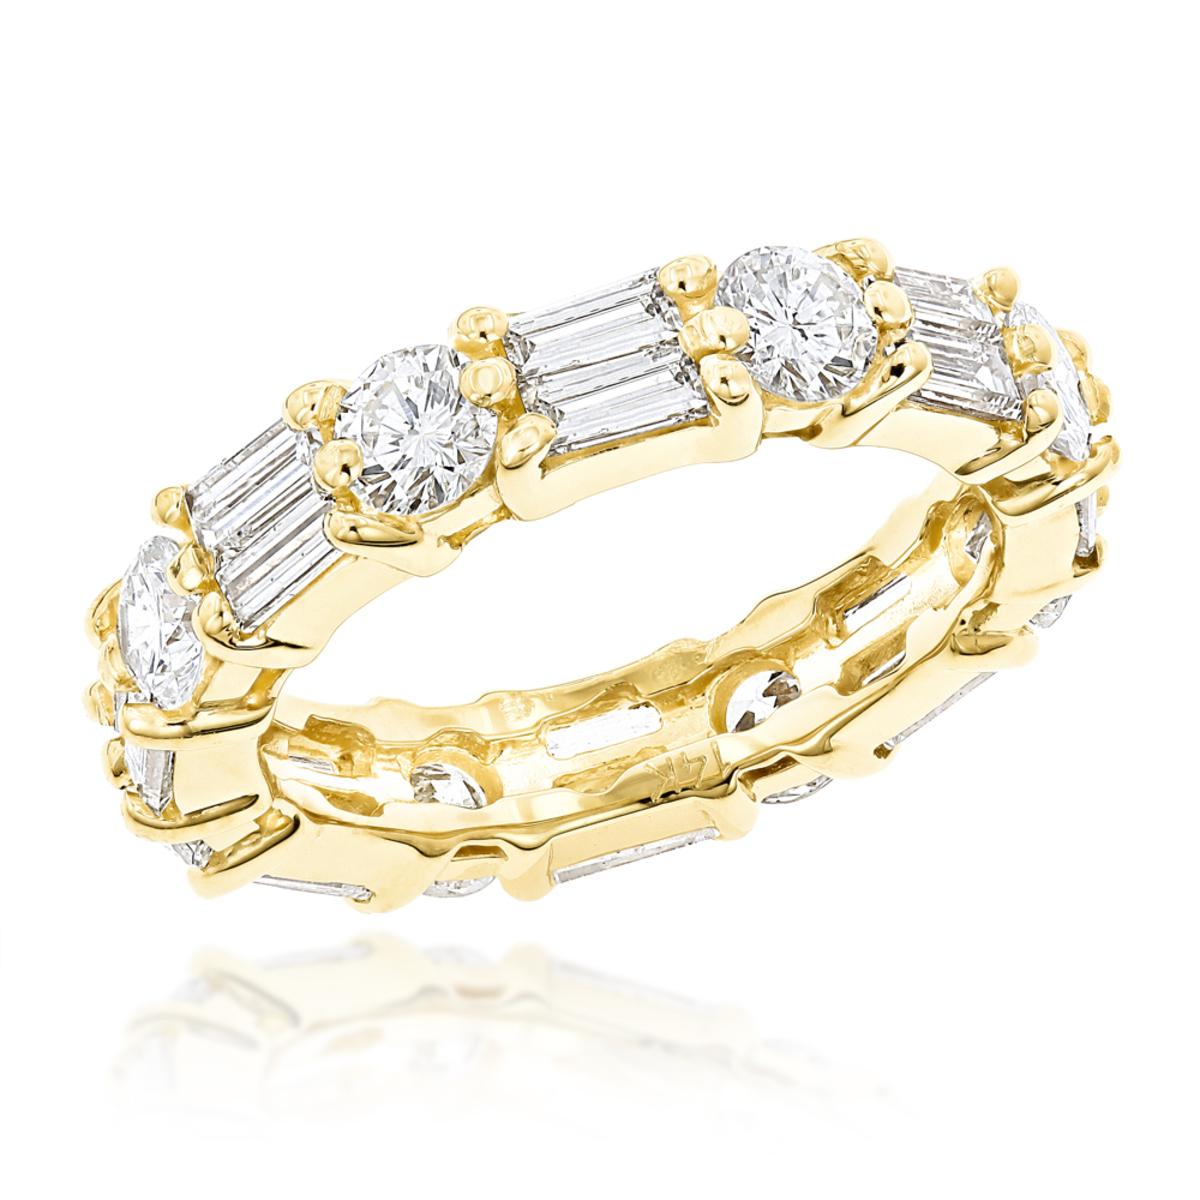 14K Gold Diamond Eternity Band 2.96ct